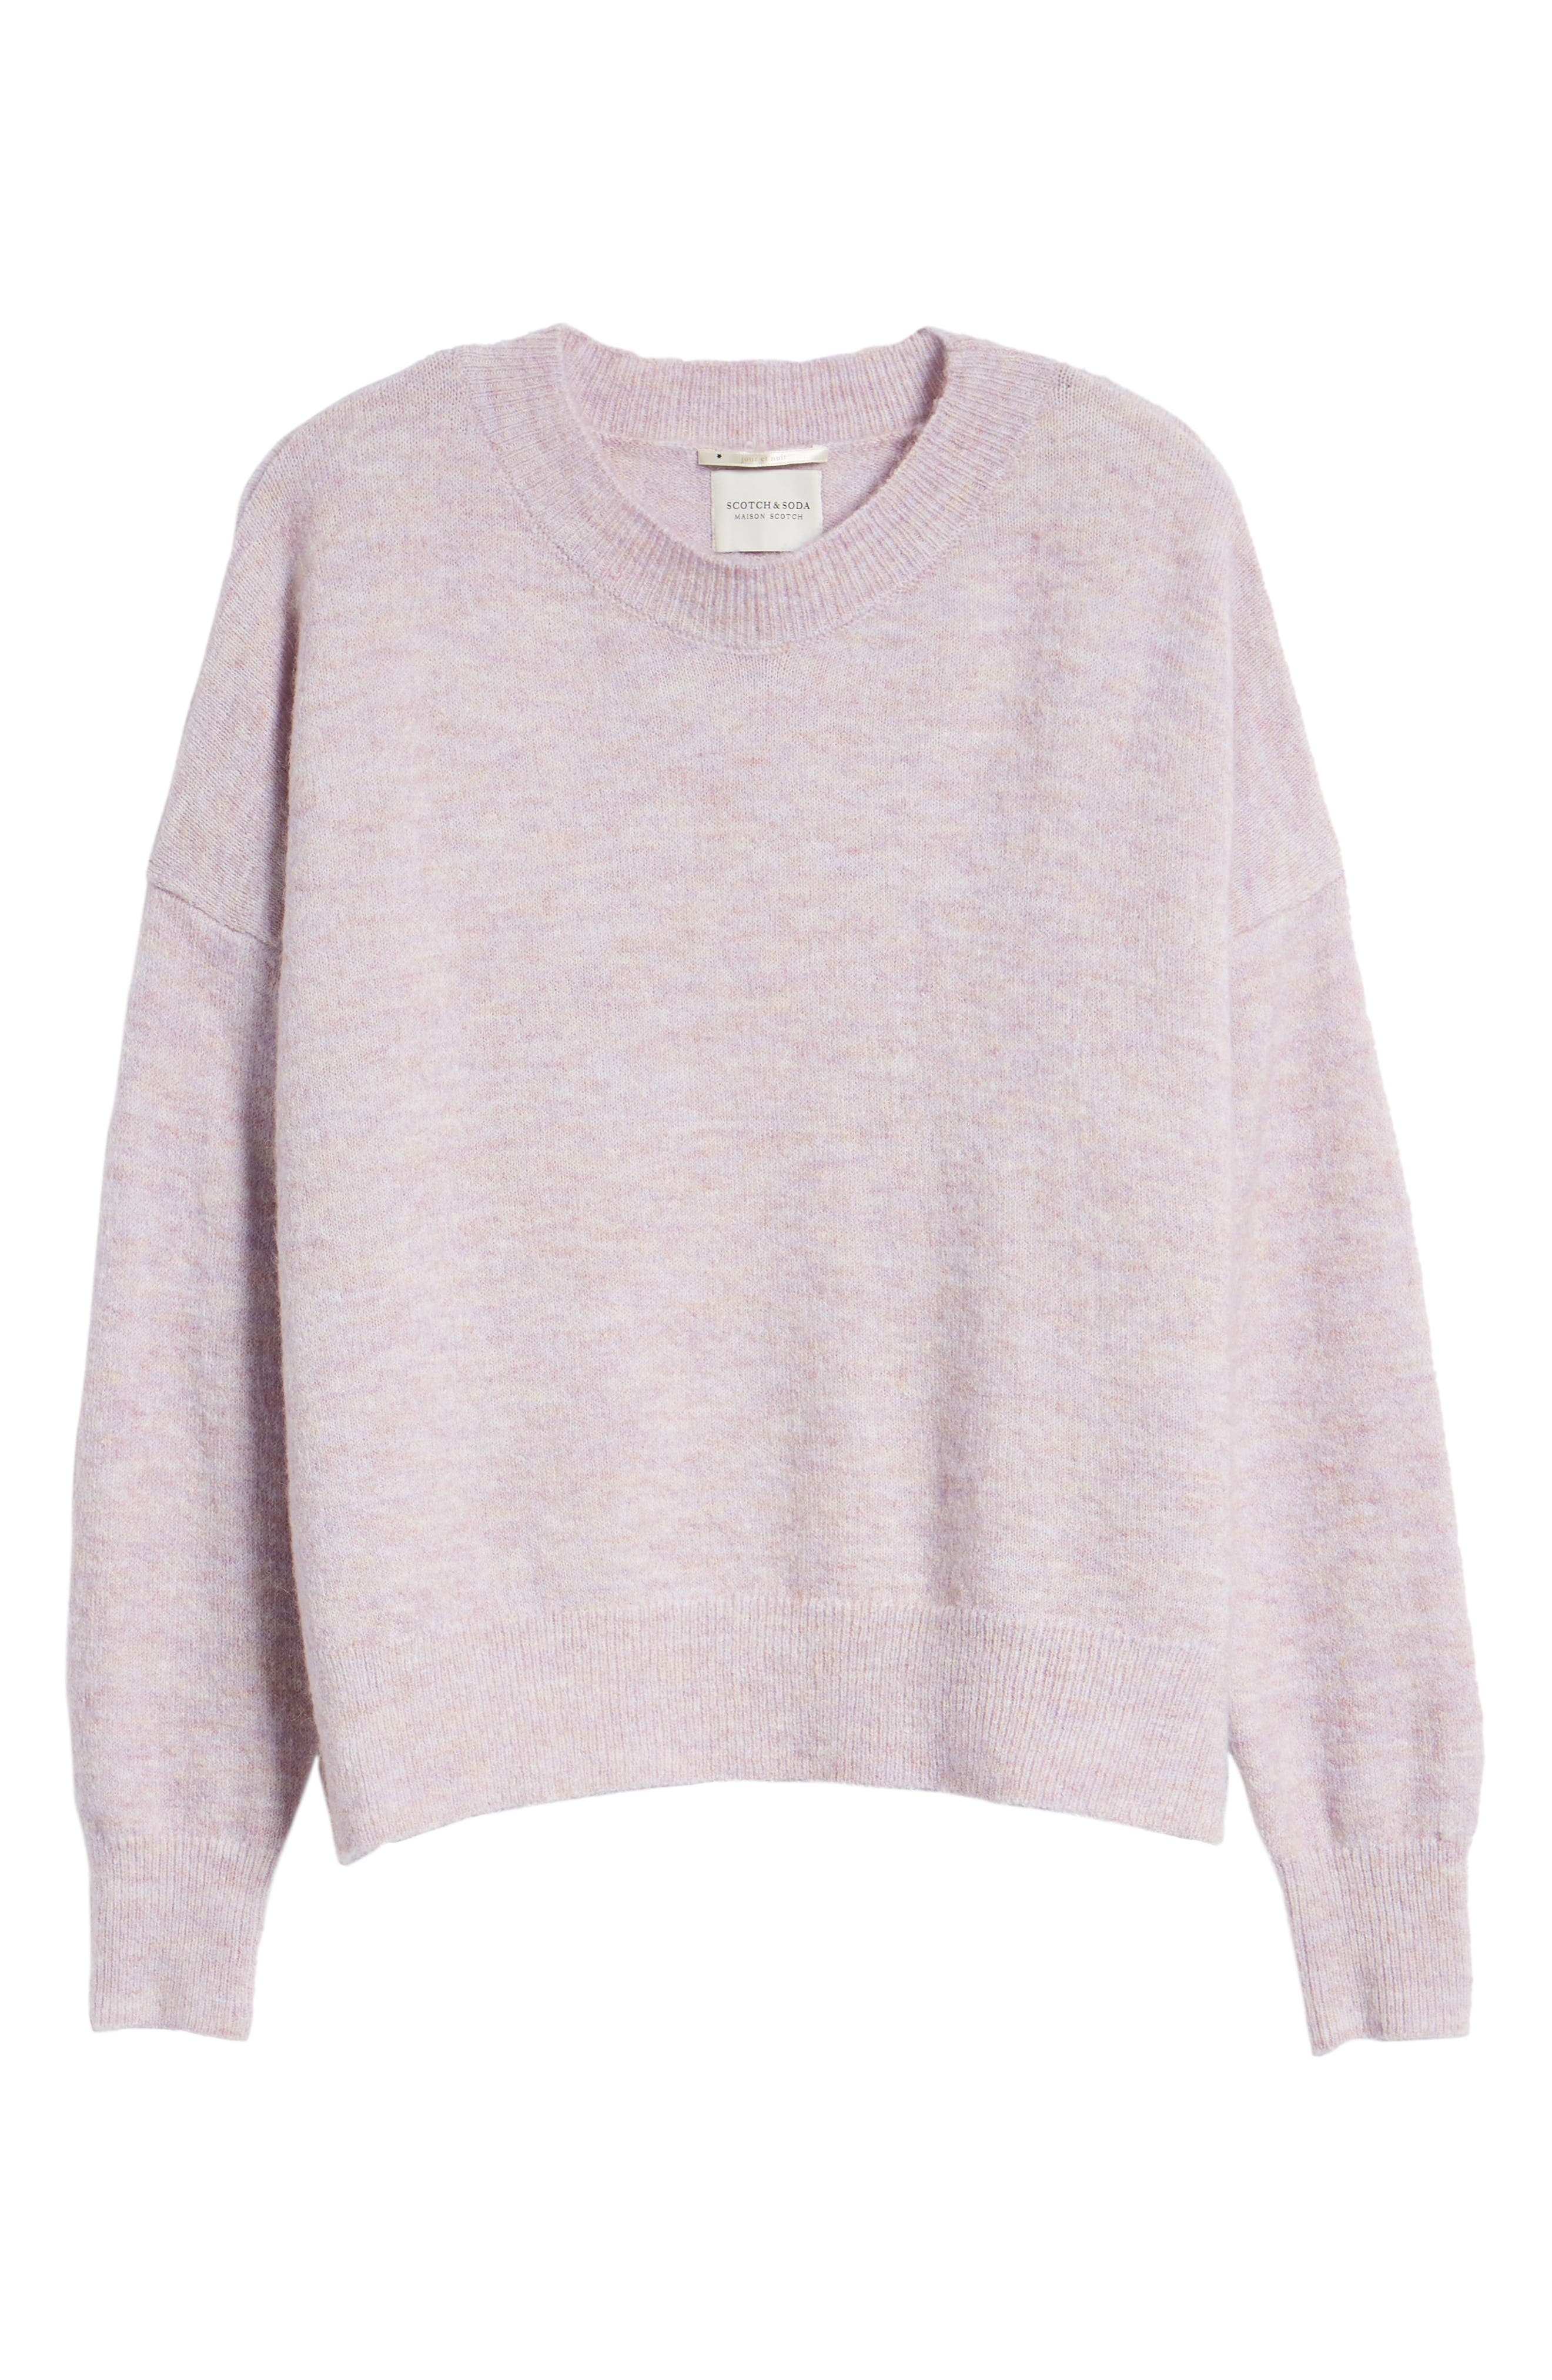 Crewneck Sweater,                             Alternate thumbnail 6, color,                             LILAC MELANGE